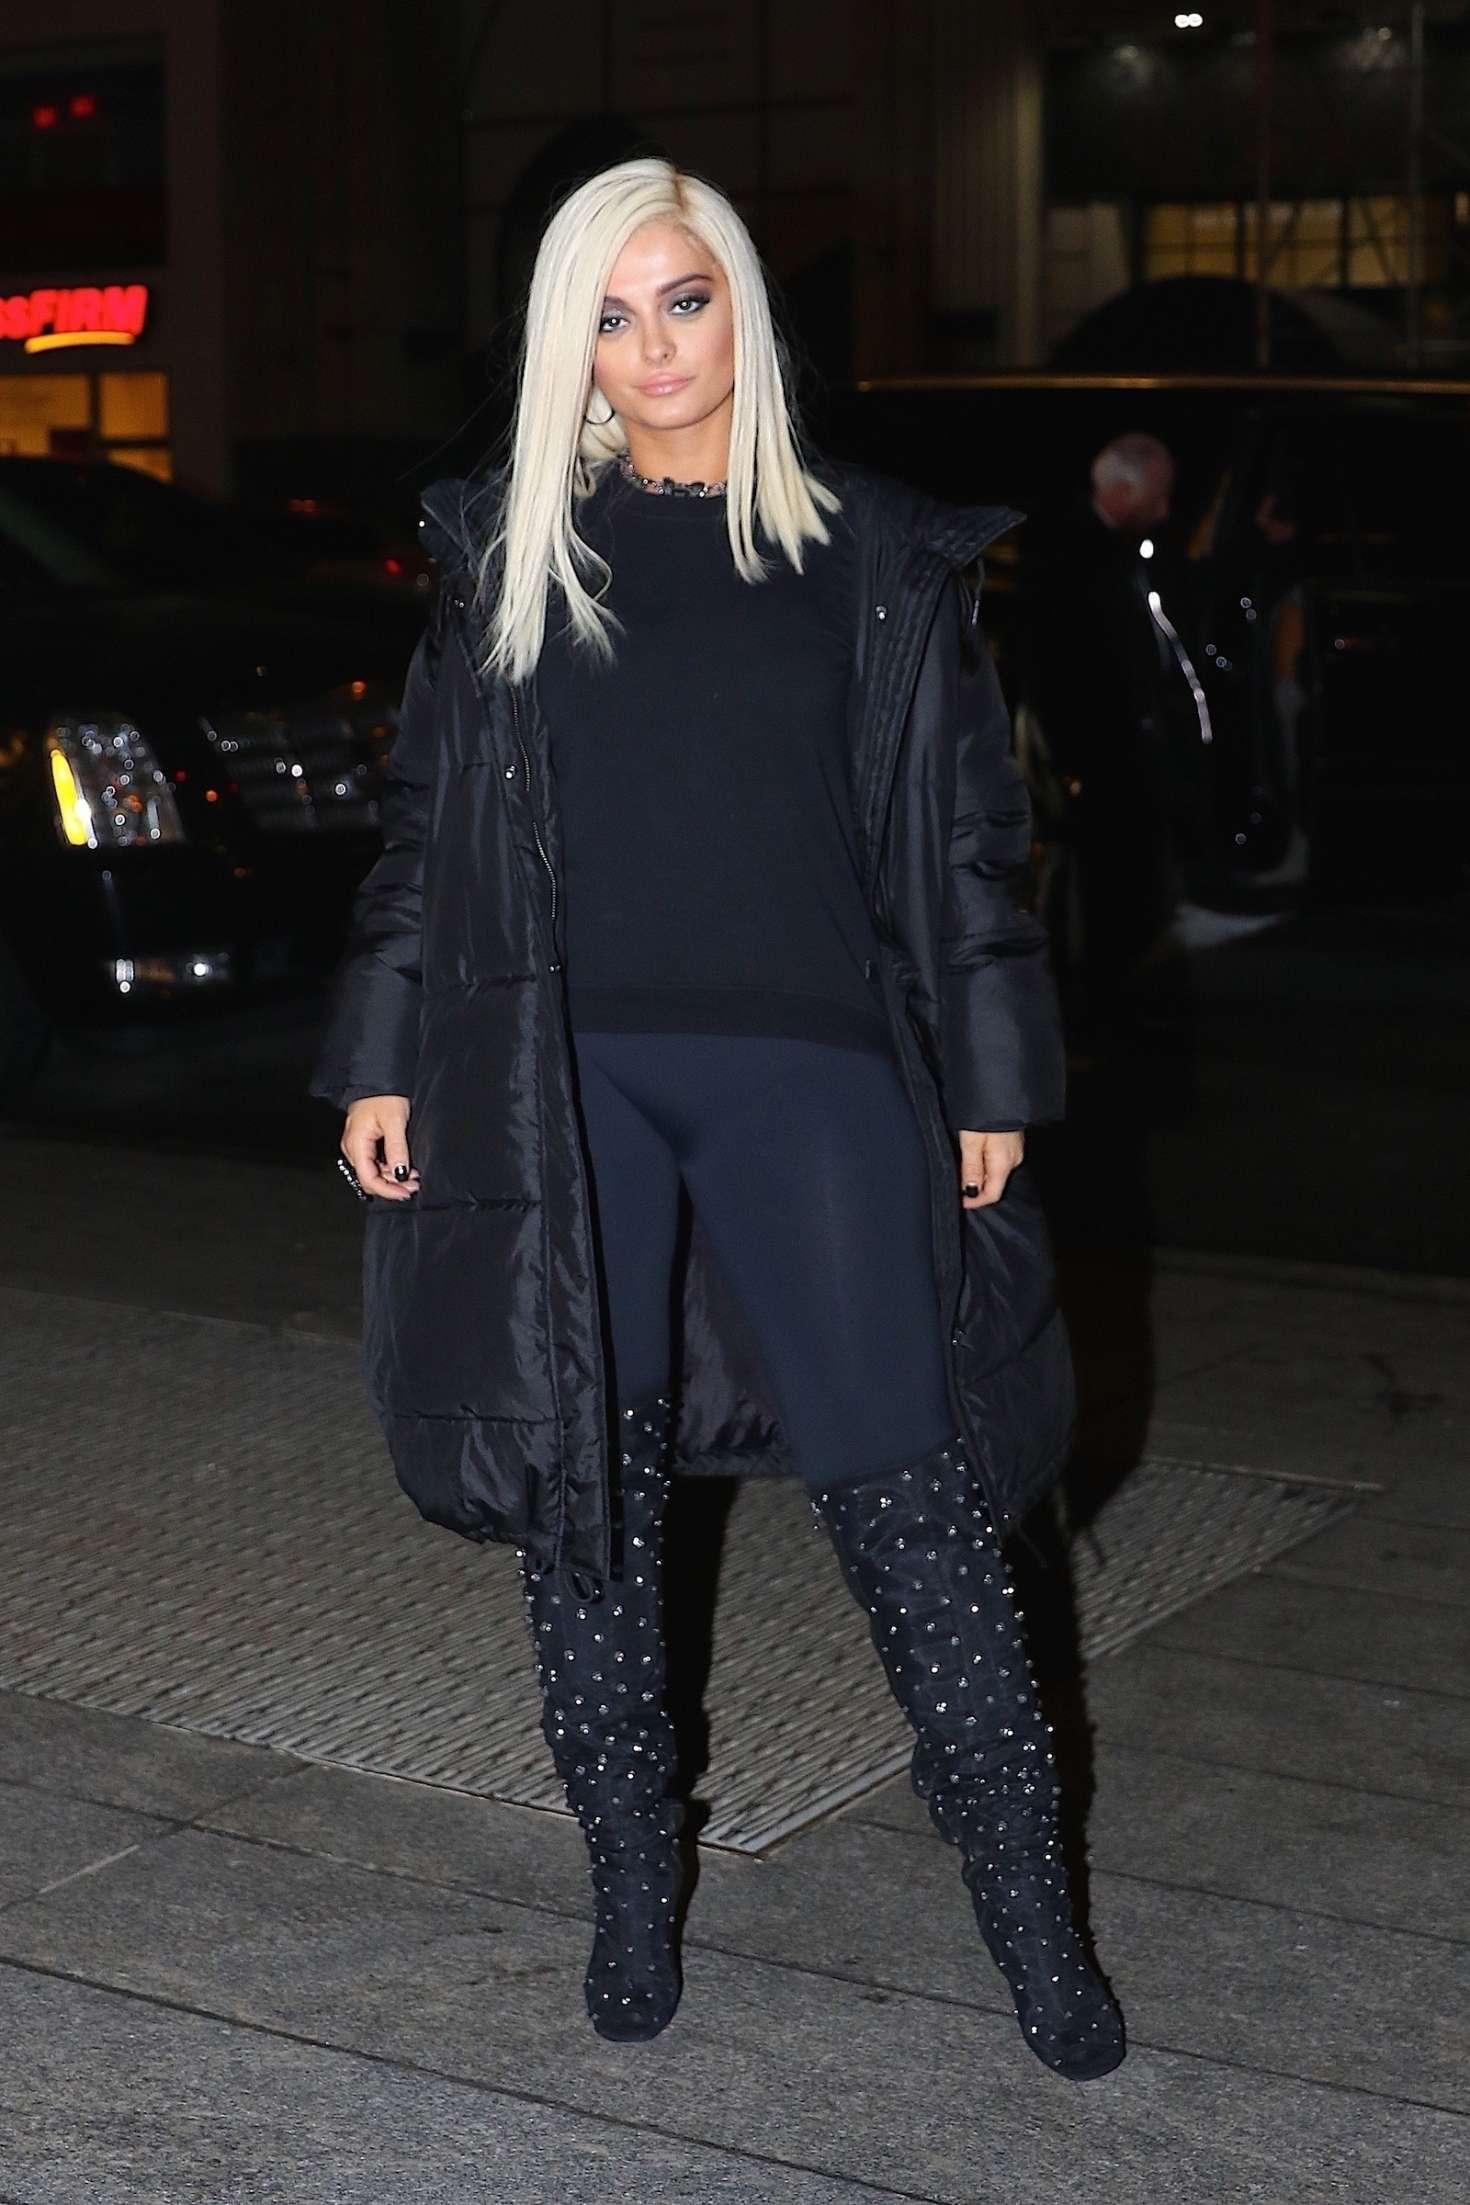 Bebe Rexha In Black Arriving To Nobu For Dinner In Nyc